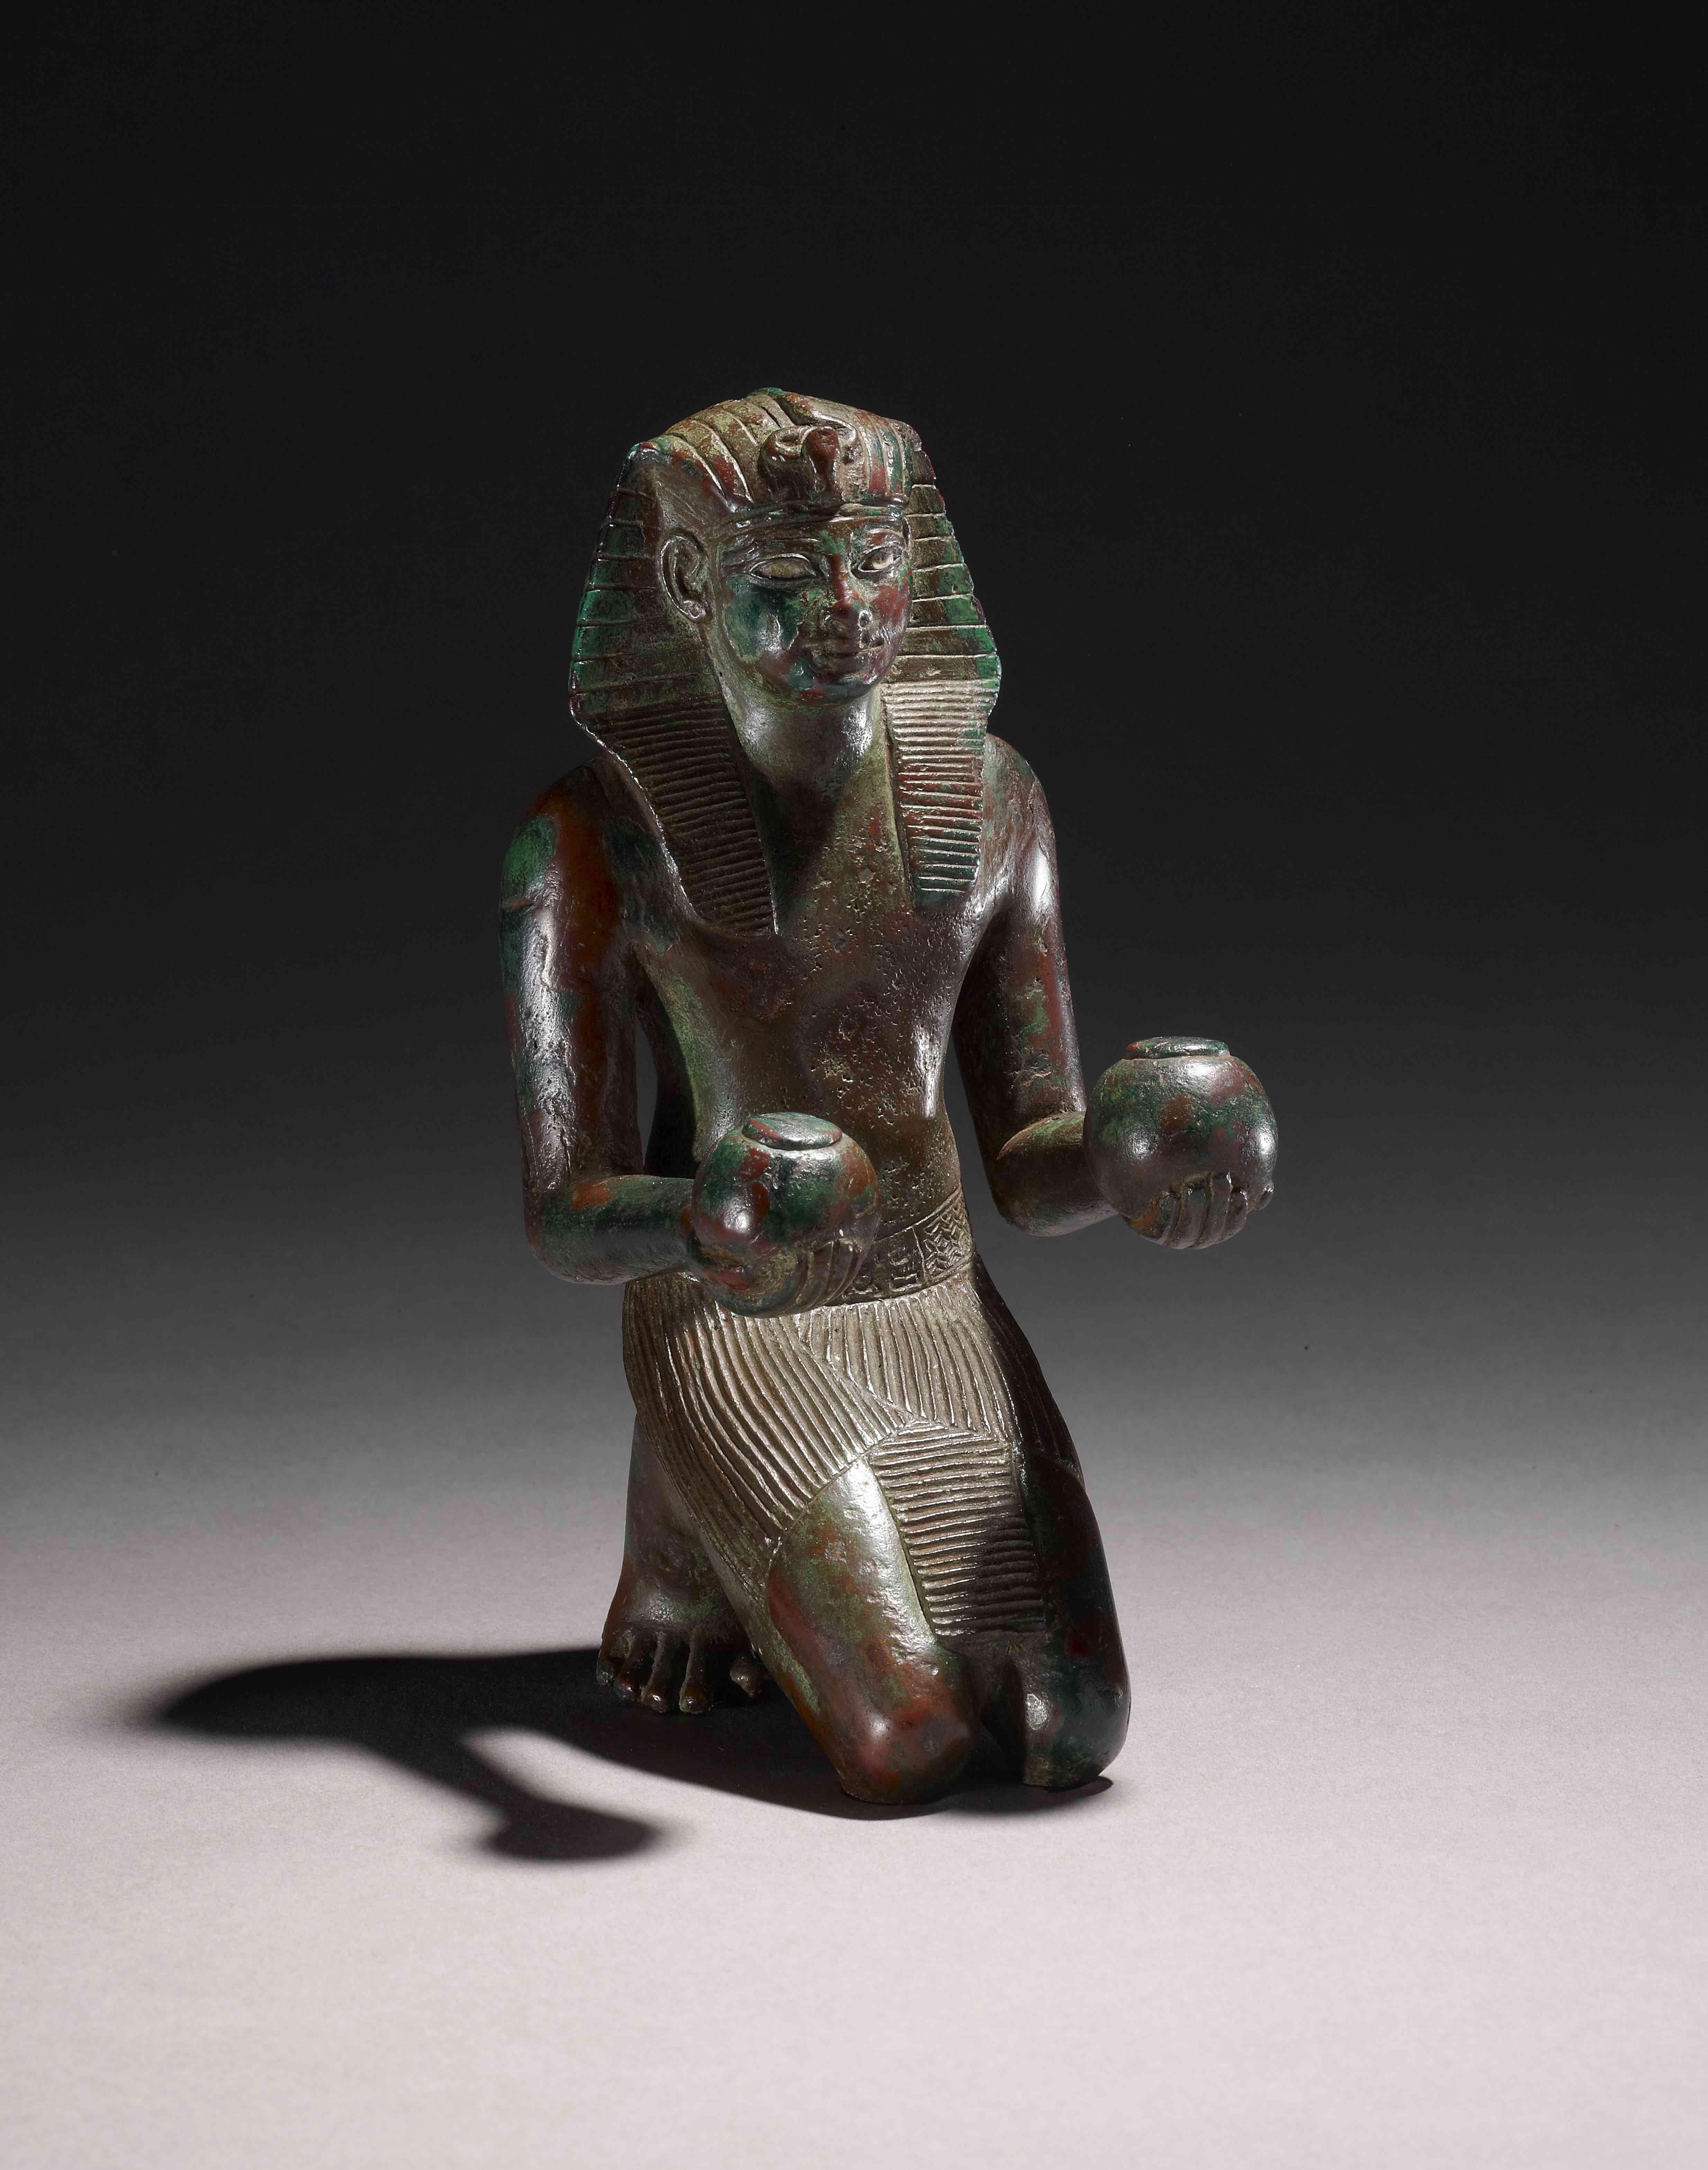 estatuilla-del-faraon-tutmosis-iv-bronce-dinastia-xviii-reinado-de-tutmosis-iv-c-1400-1390-a-c-egipto-c-trustees-of-th